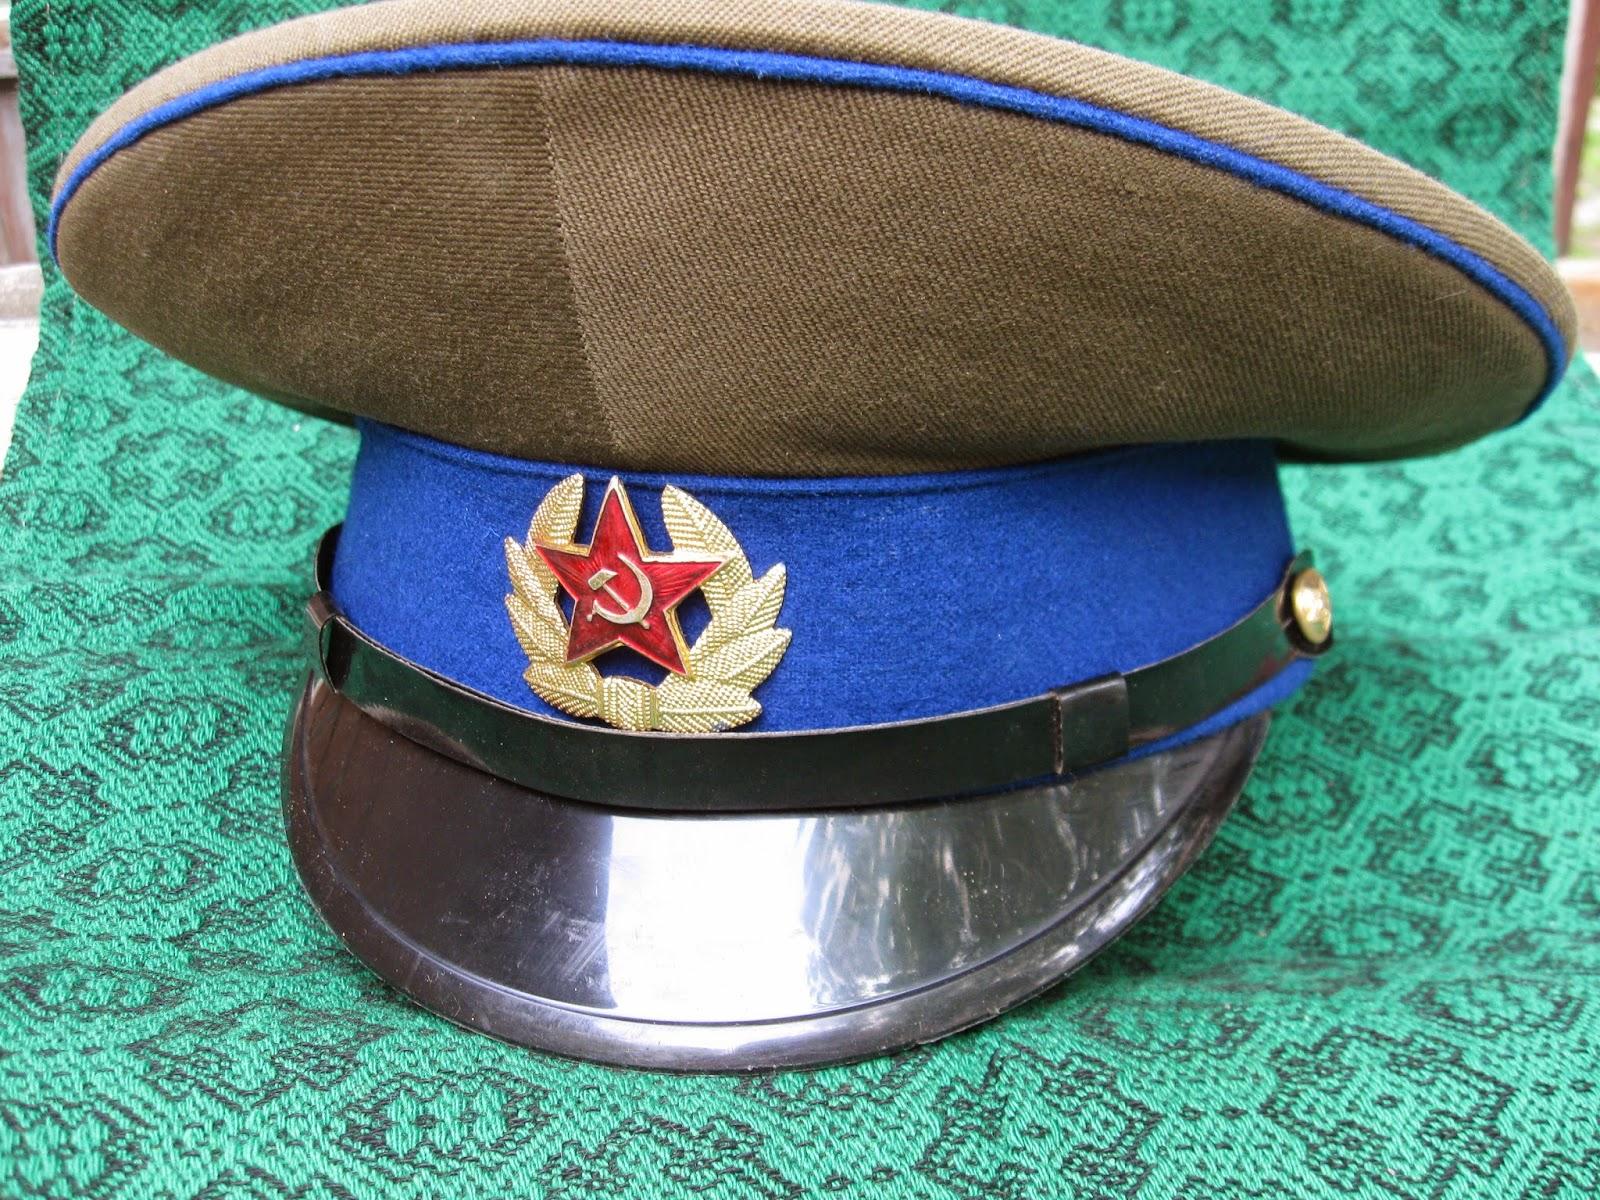 фуражка КГБ солдат КГБ сержант КГБ  (2).JPG